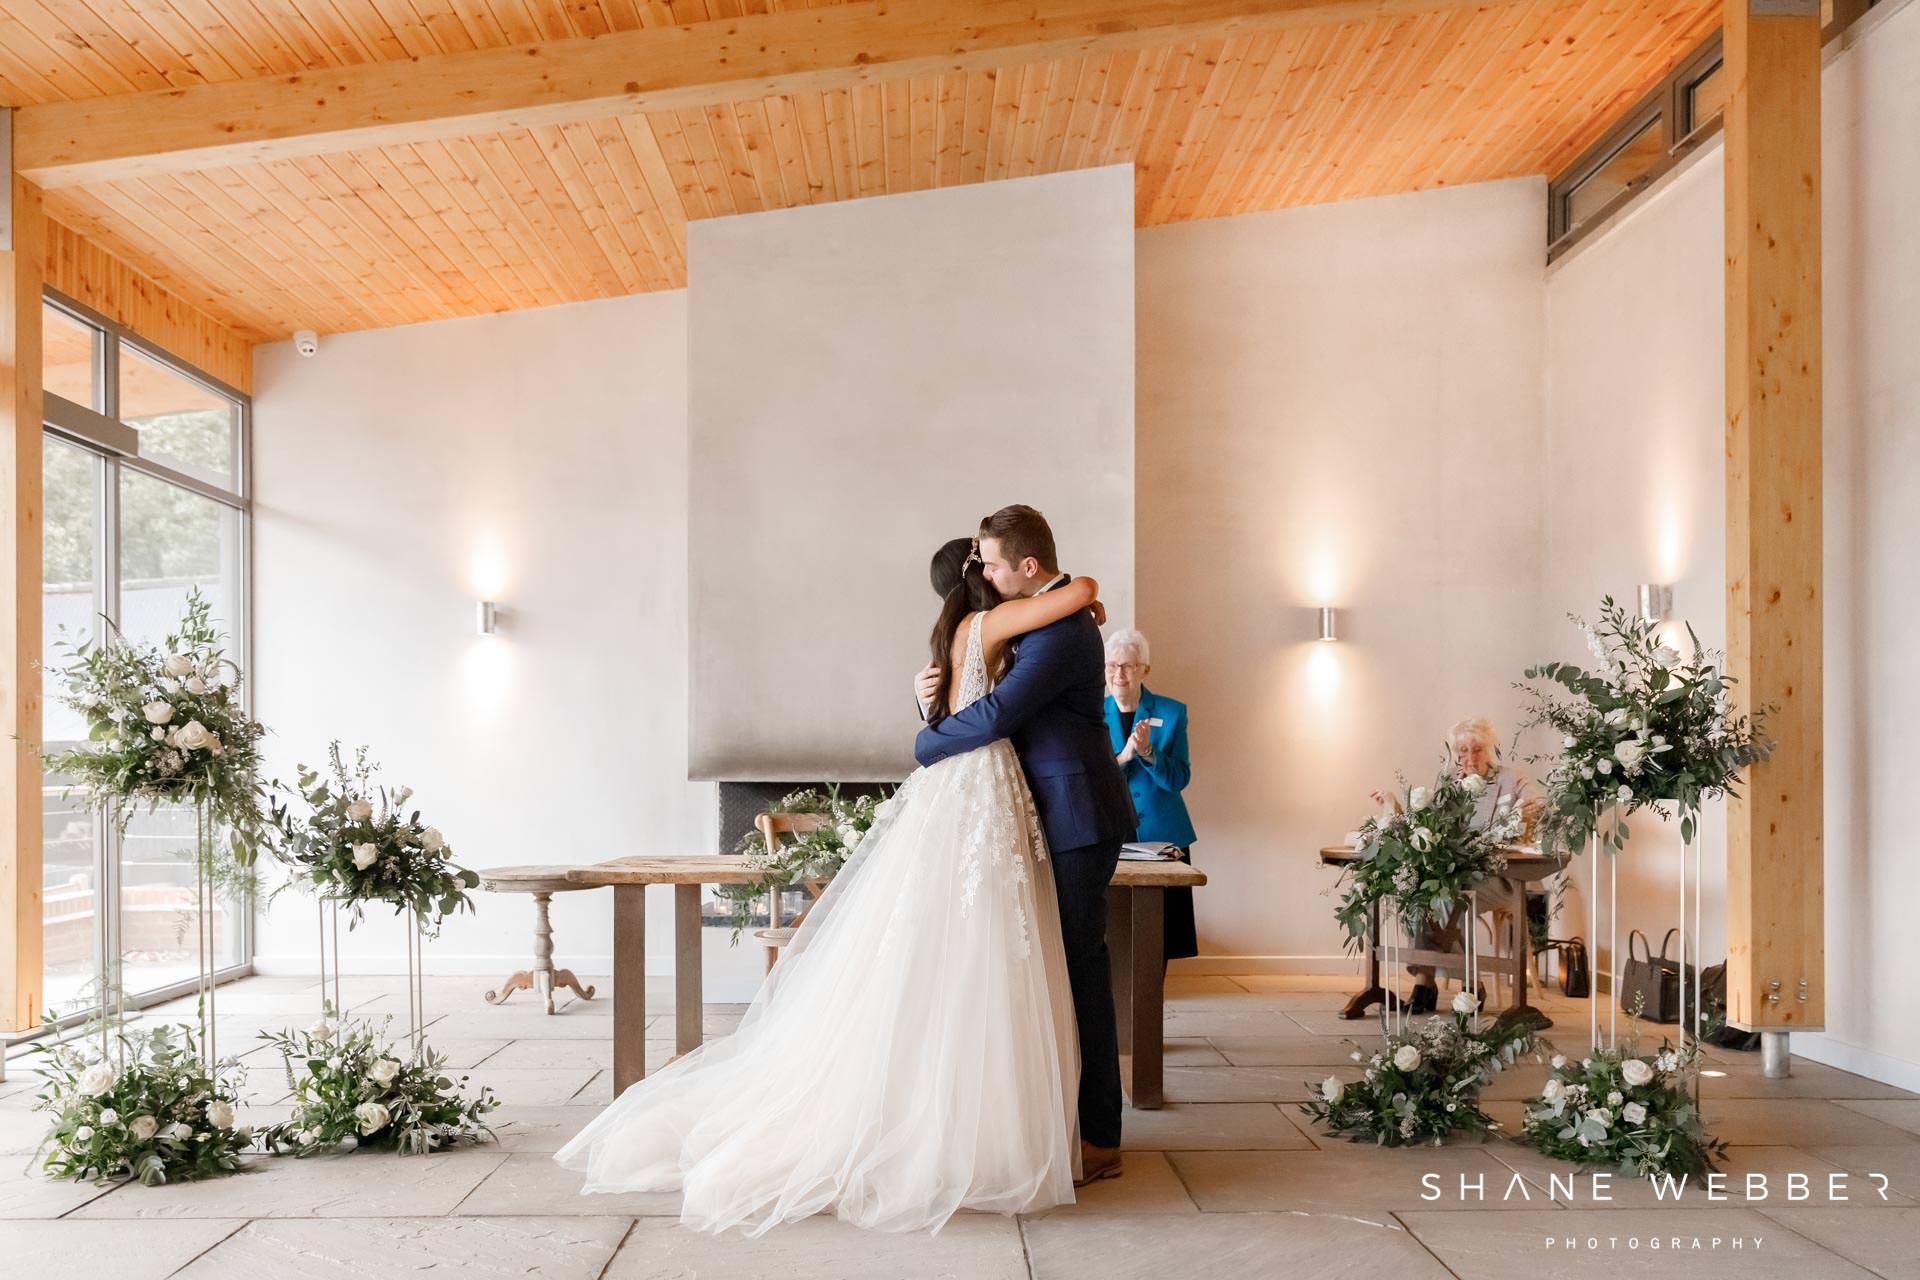 Ceremony wedding photos at Thorpe Gardens